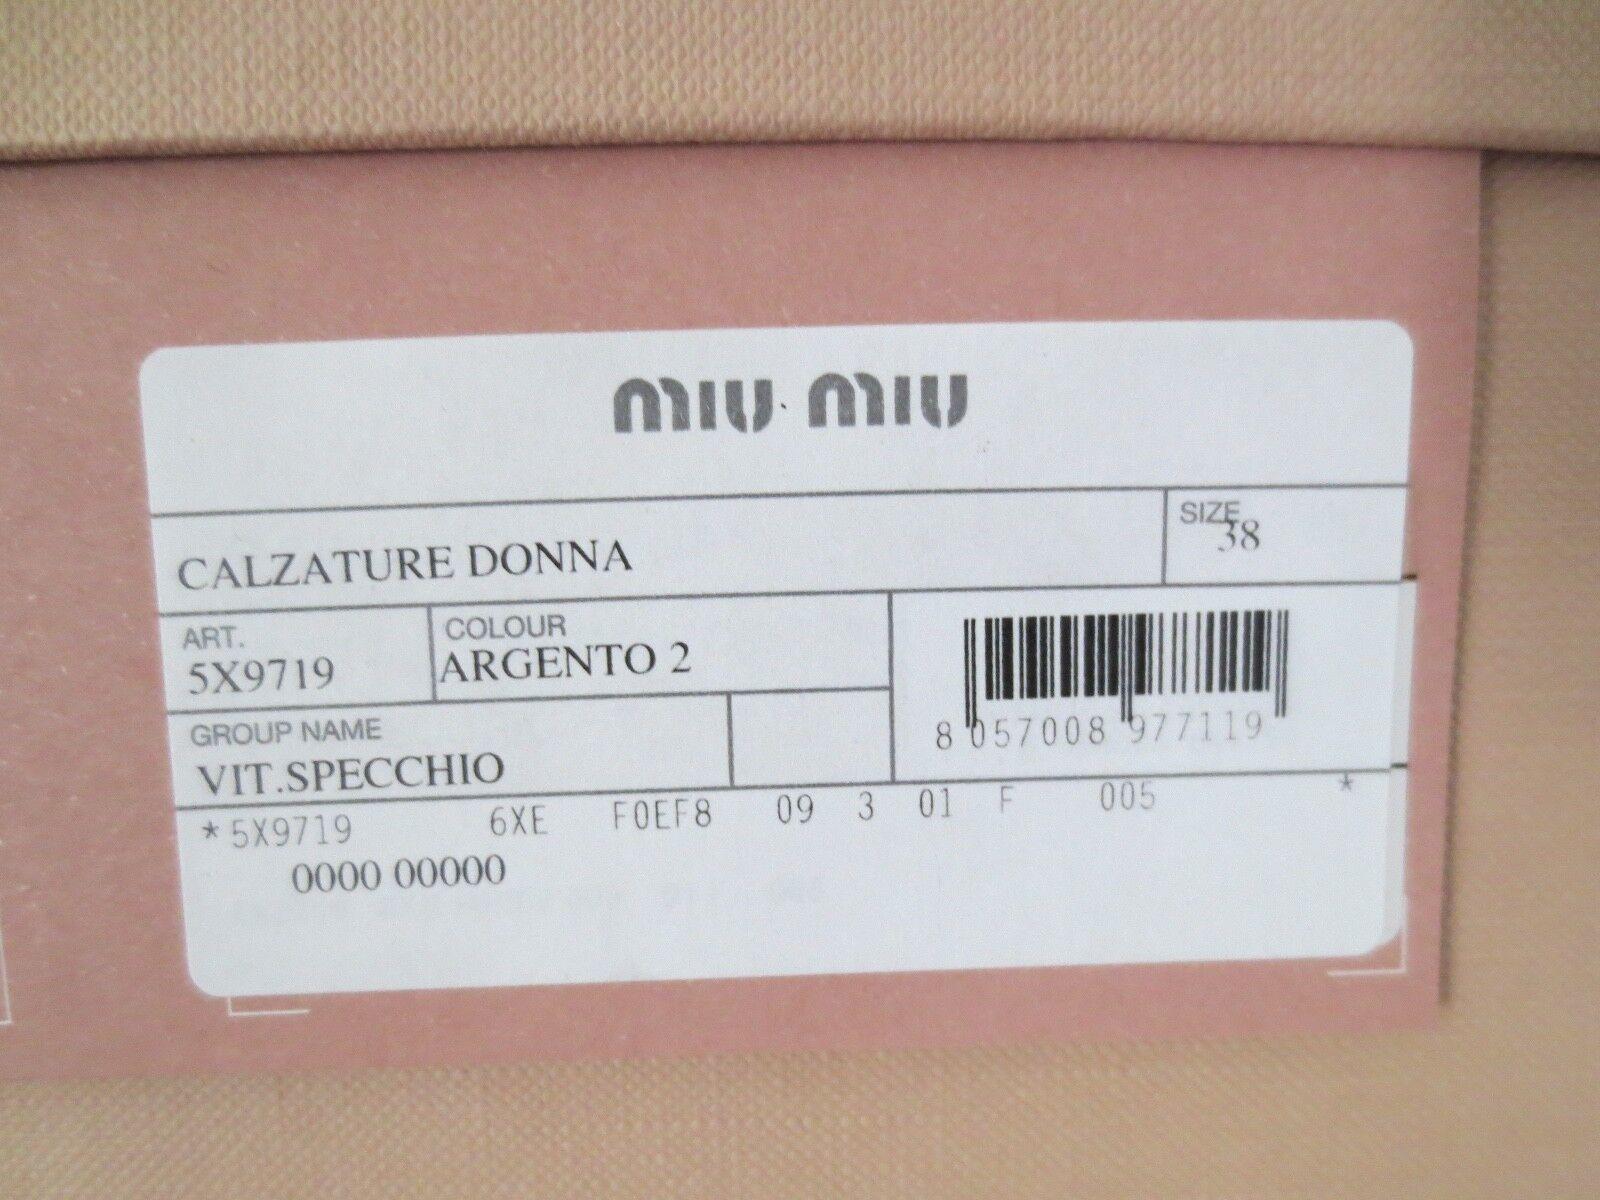 MIU MIU BY PRADA Sandali Tg. 39/38 39/38 Tg. Specchio Argento Sandali Scarpe in pelle 5e0141